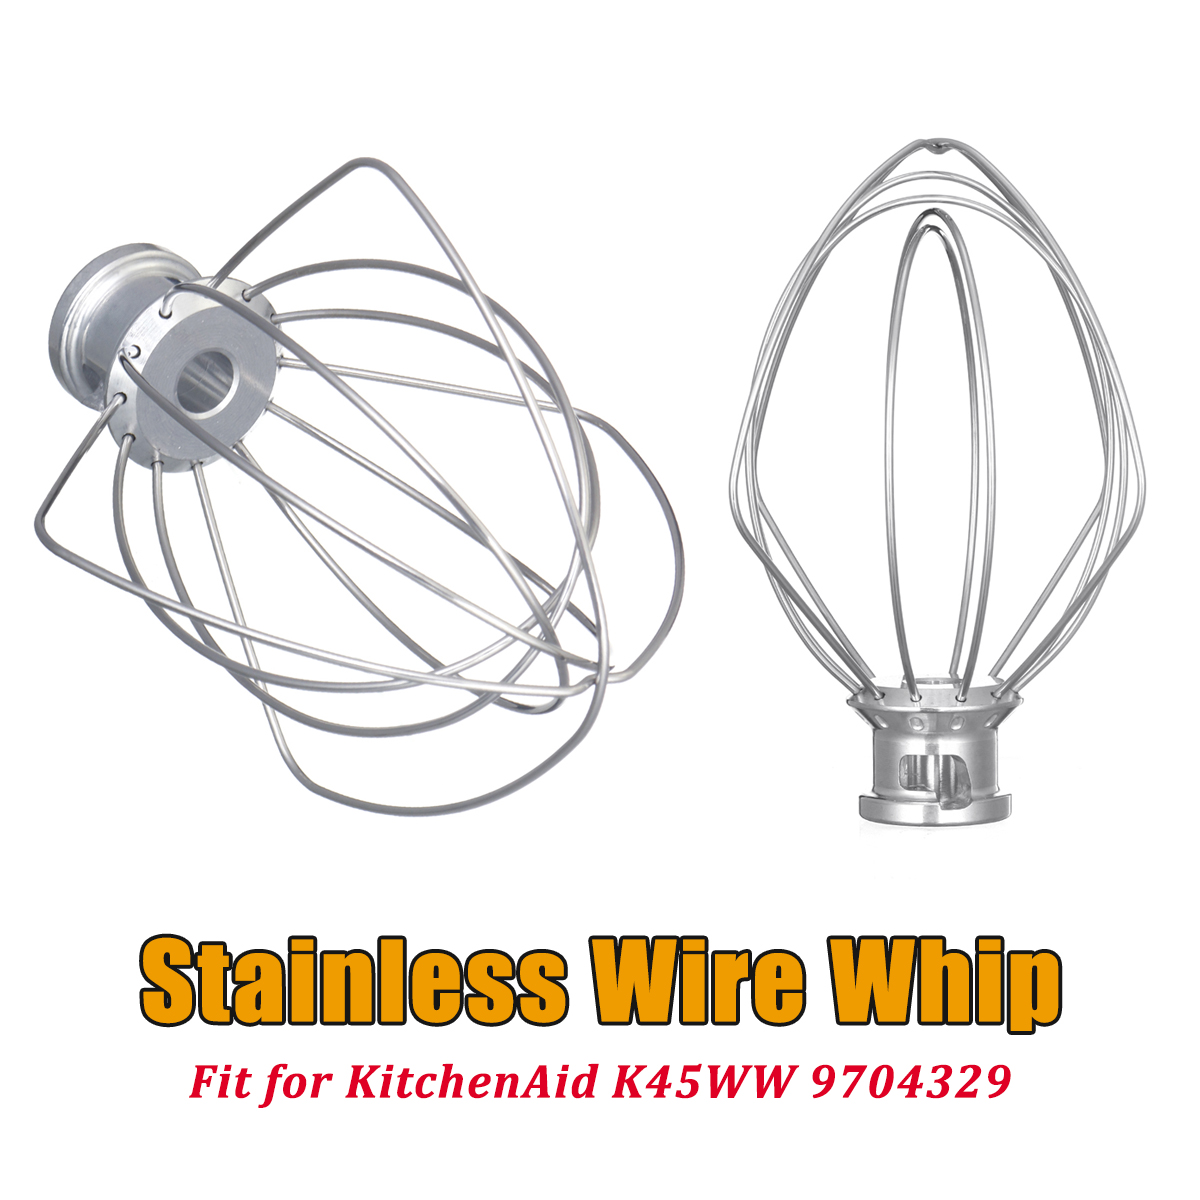 304 Stainless Steel Wire Whip Mixer Attachment For KitchenAid K45WW 9704329 For Mixers Milkshakes Noodle Makers kitchenaid венчик для 5ksm90 5k45 5ksm150ps k45ss k45ww kitchenaid